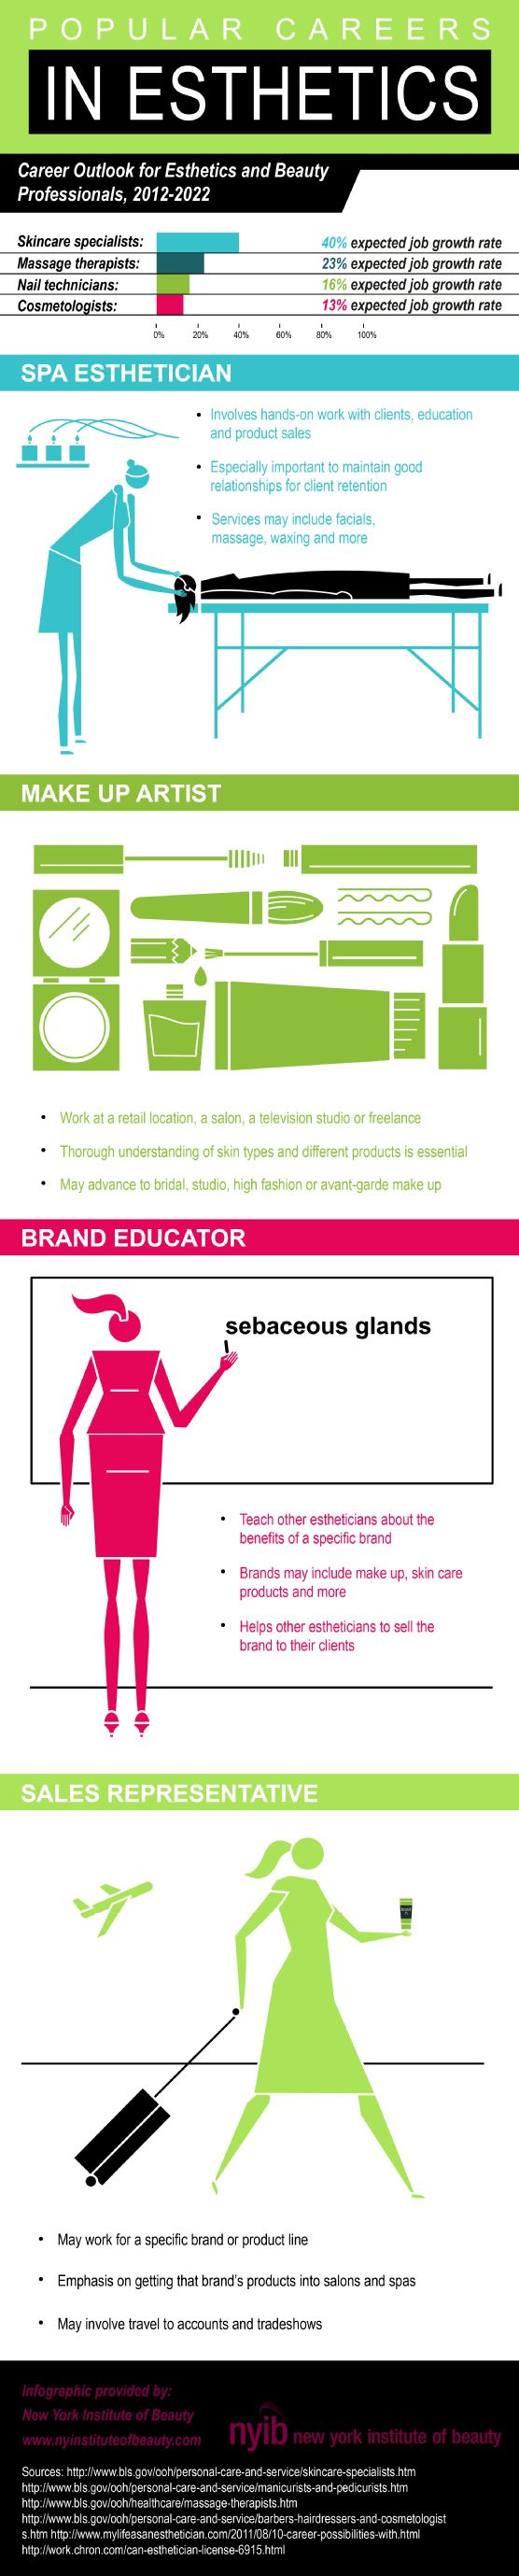 Popular Careers in Esthetics   #Infographic #Career  #Esthetics